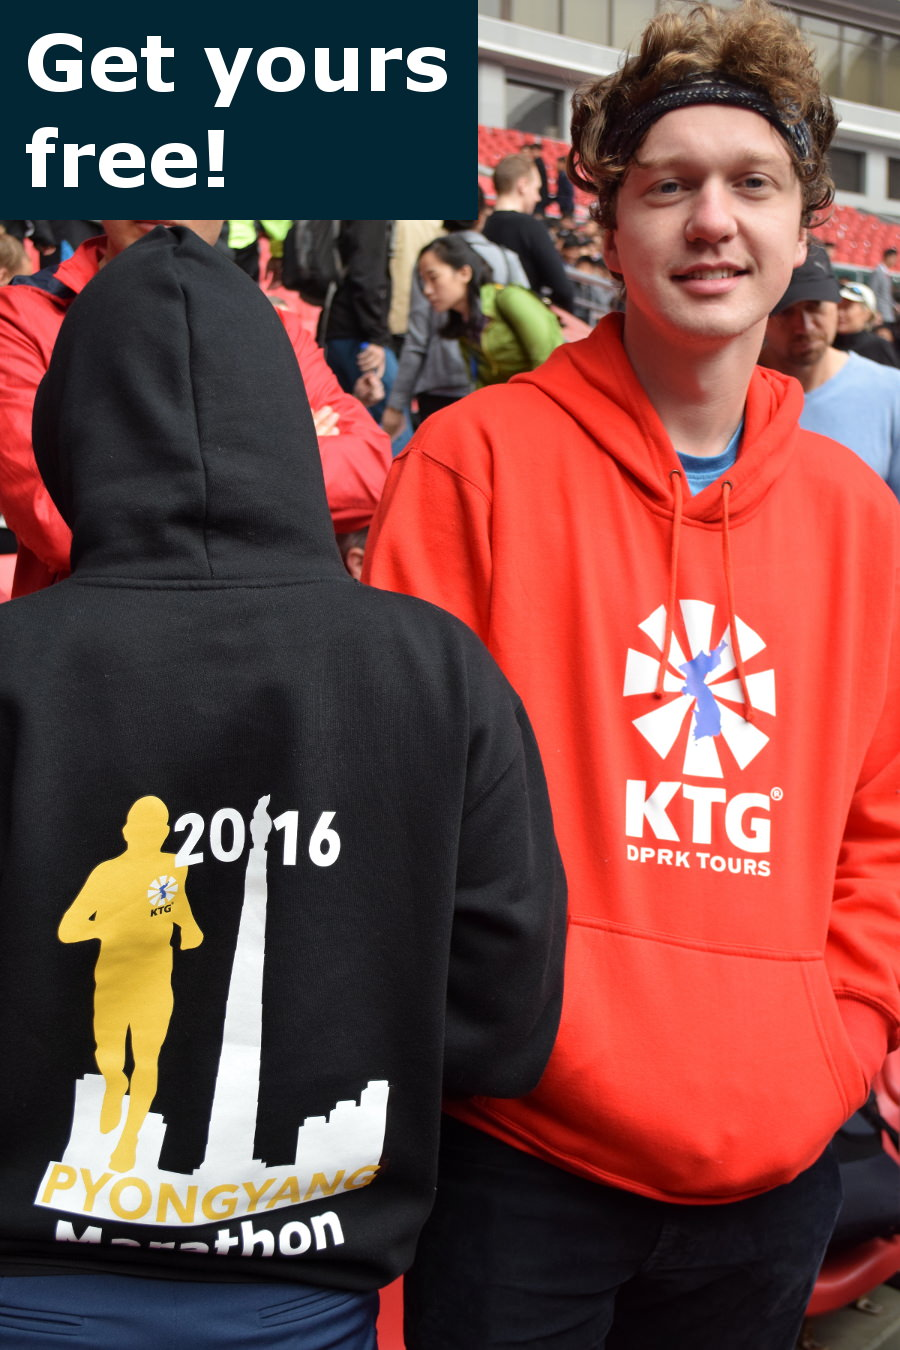 Ricevi una felpa gratuita della Maratona di Pyongyang ideata da KTG